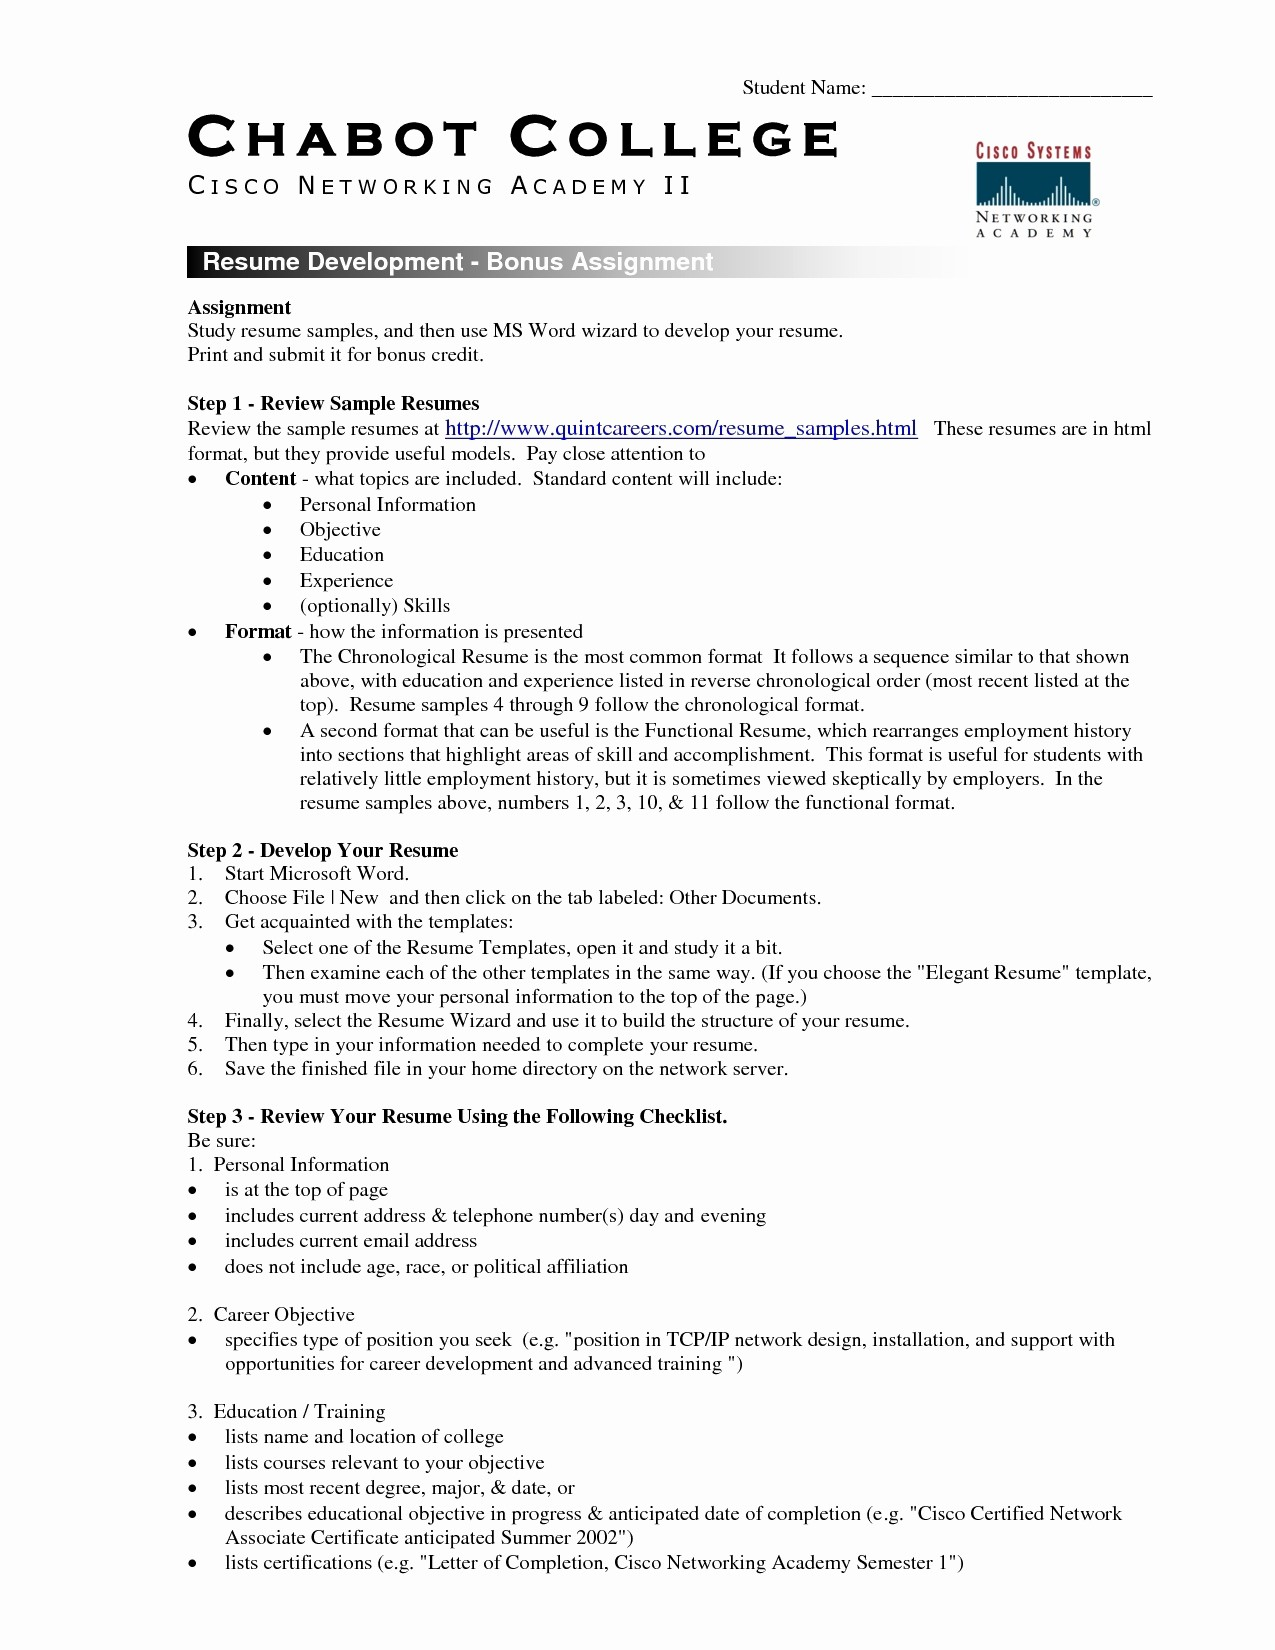 Free Resume Templates 2017 Word New Resume Template Microsoft Word 2017